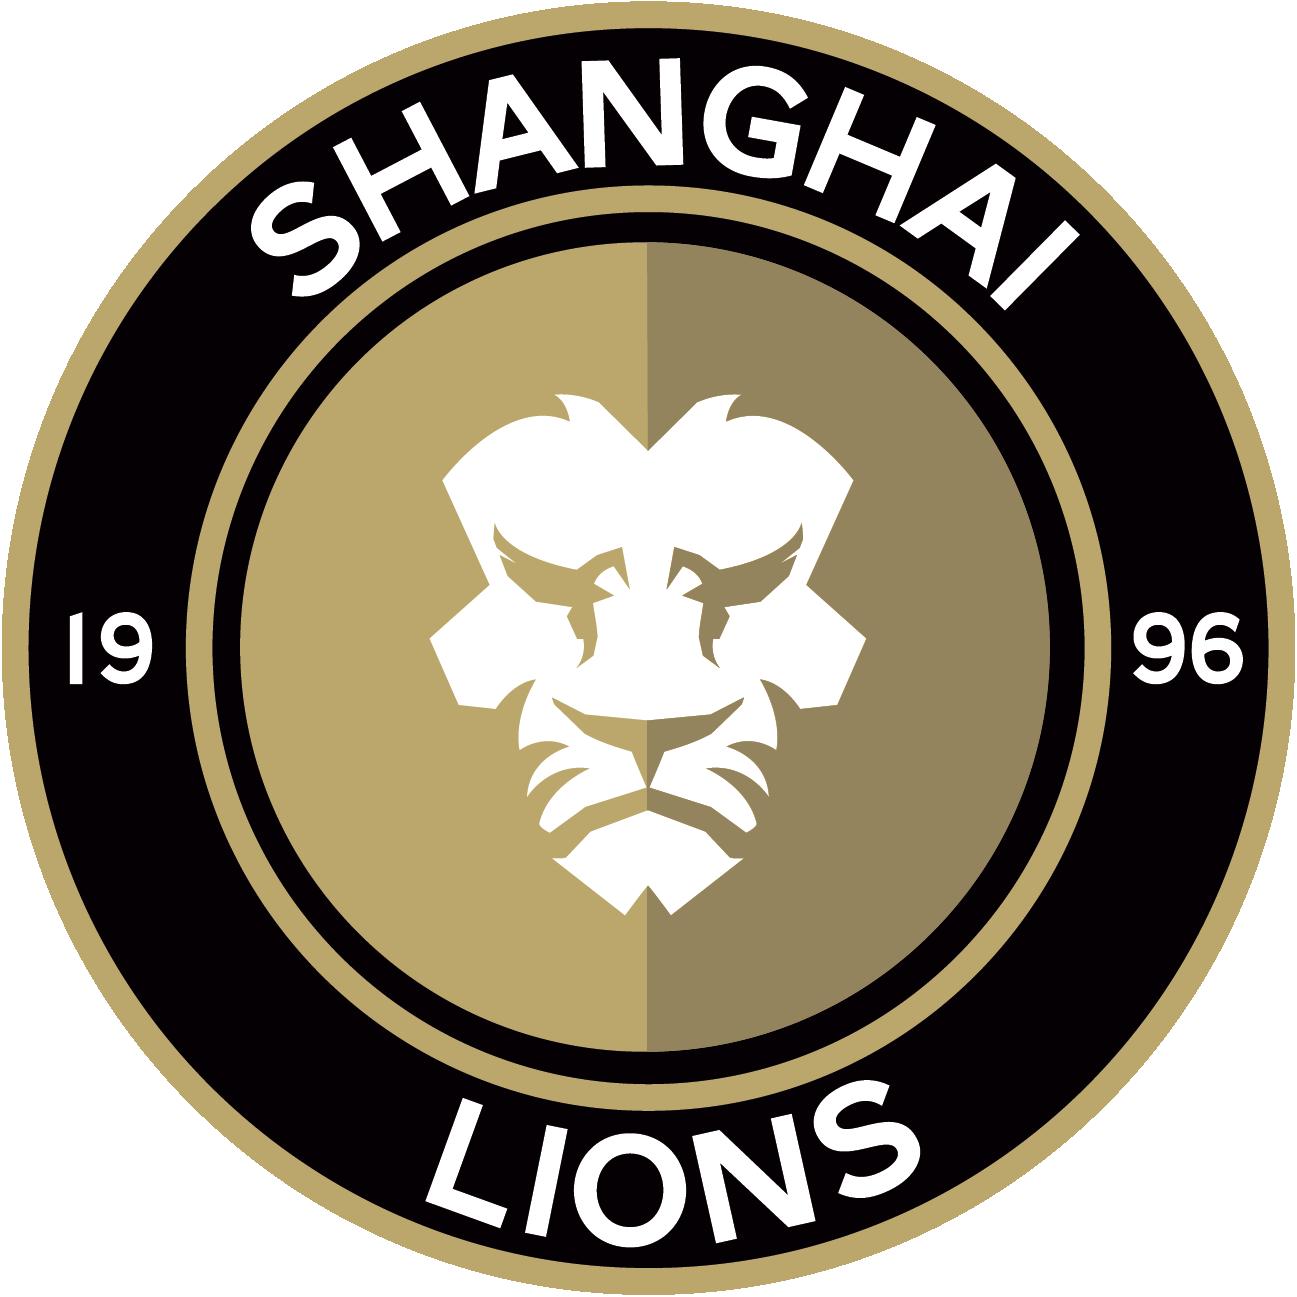 The Best Amateur Football Club in Shanghai